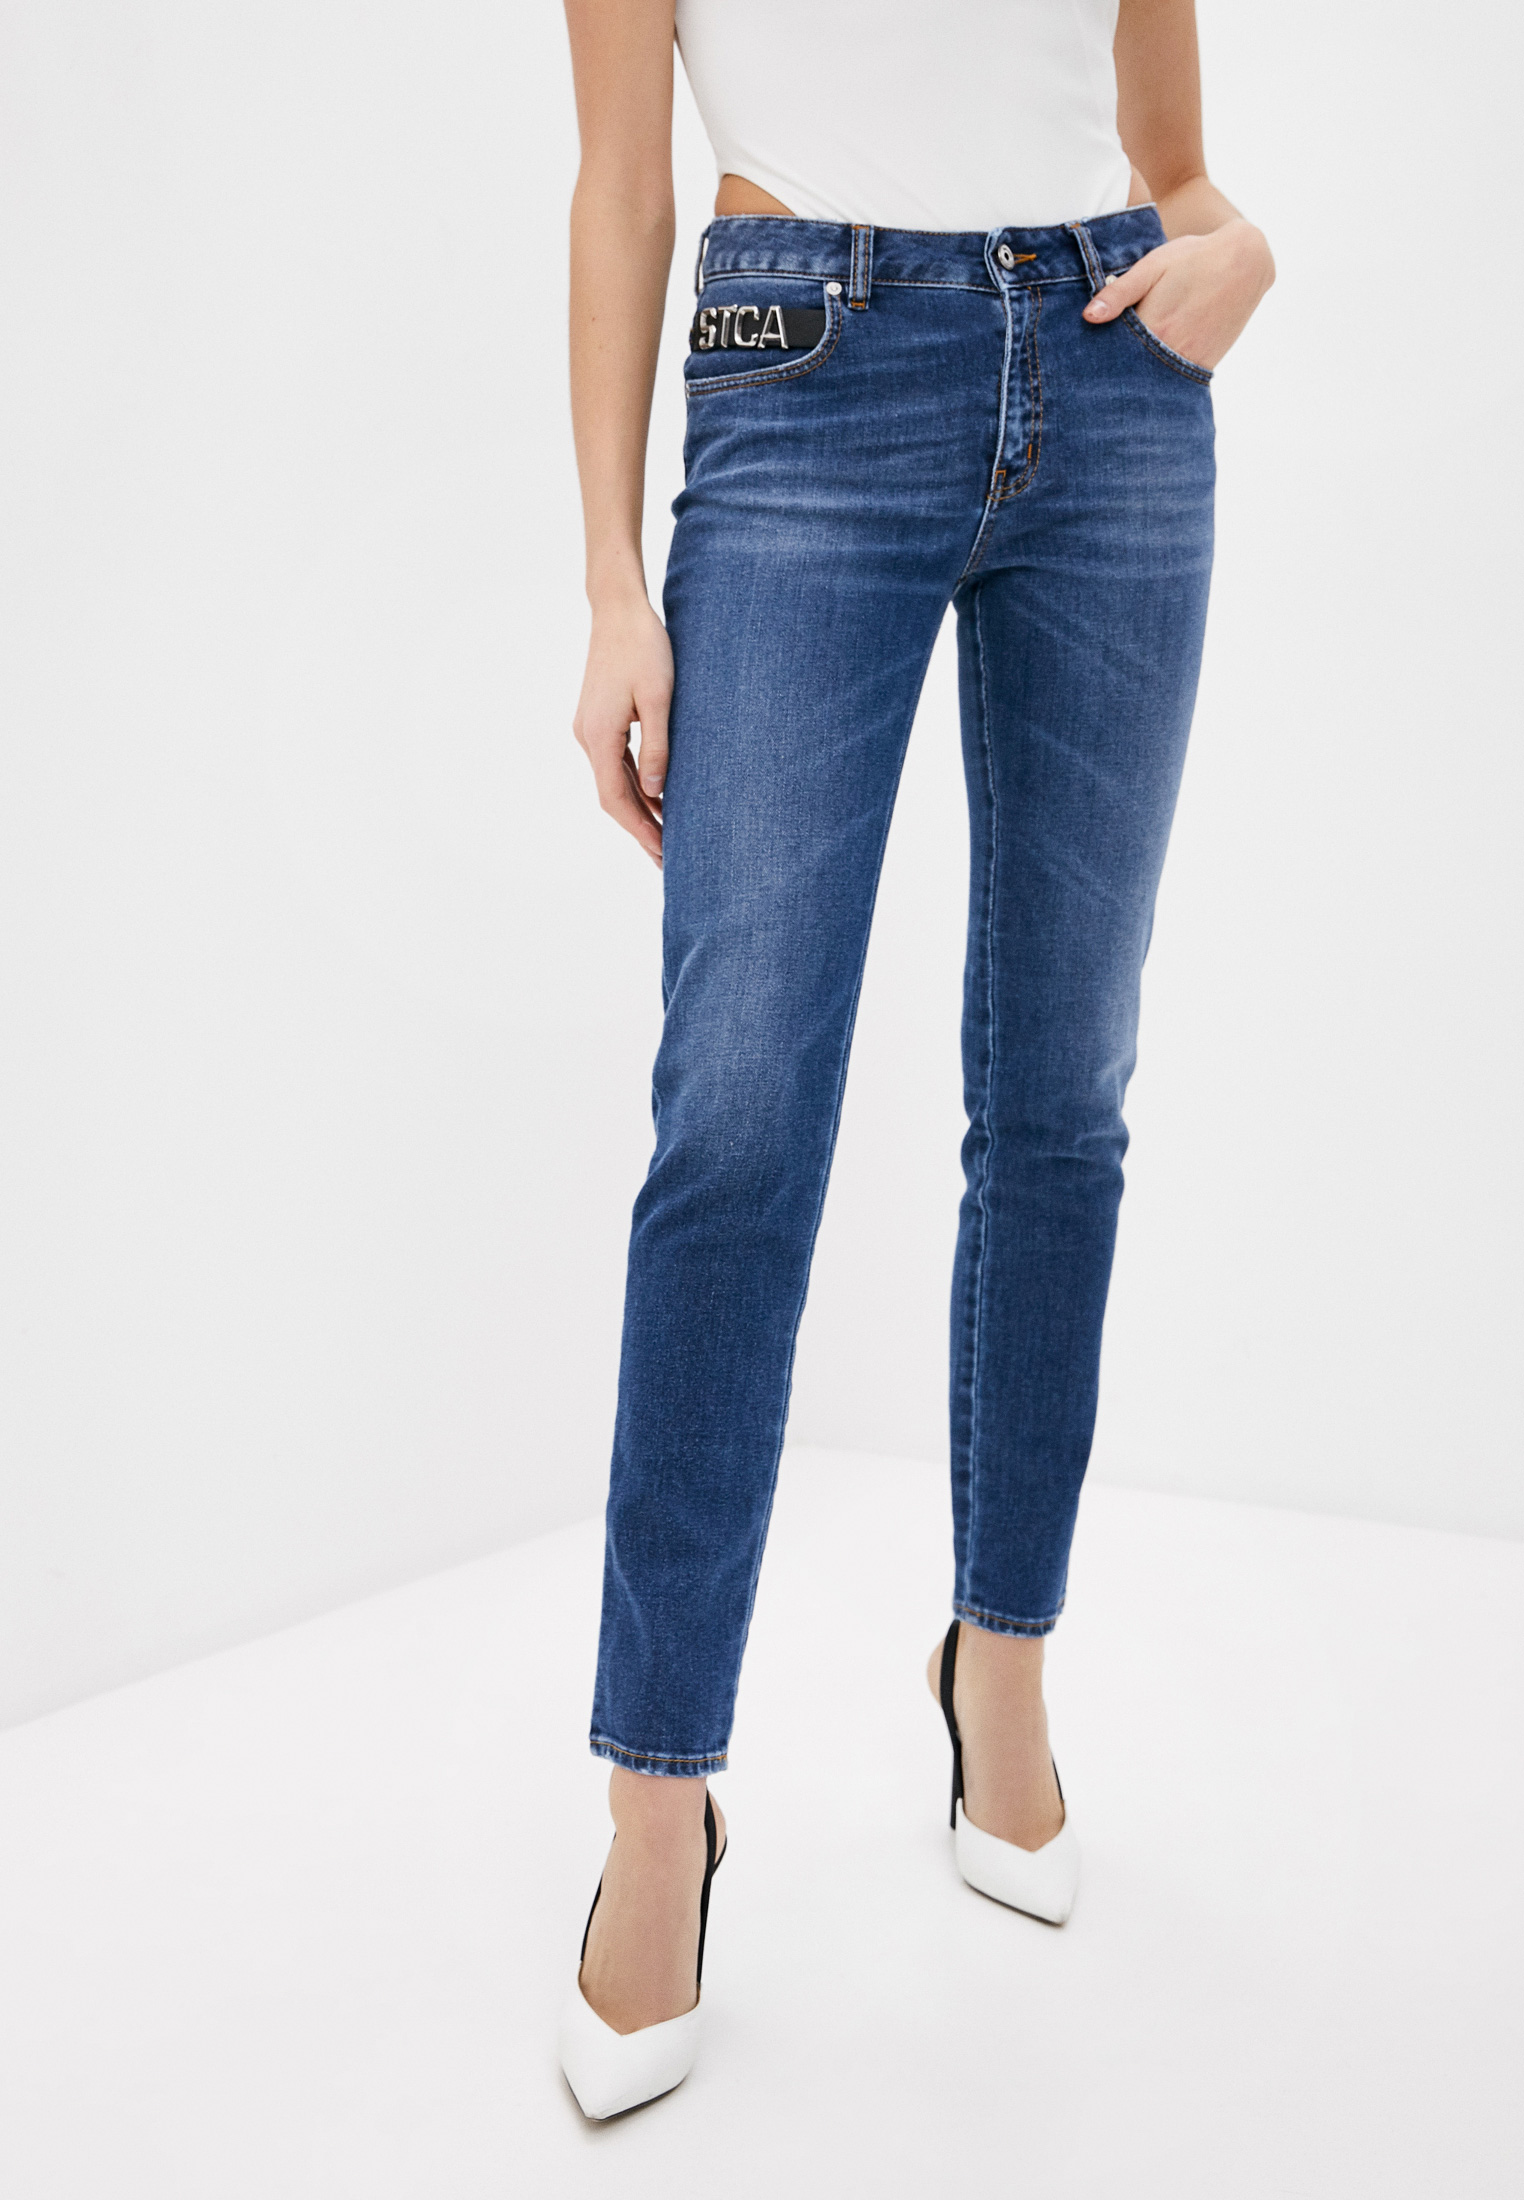 Зауженные джинсы Just Cavalli (Джаст Кавалли) Джинсы Just Cavalli